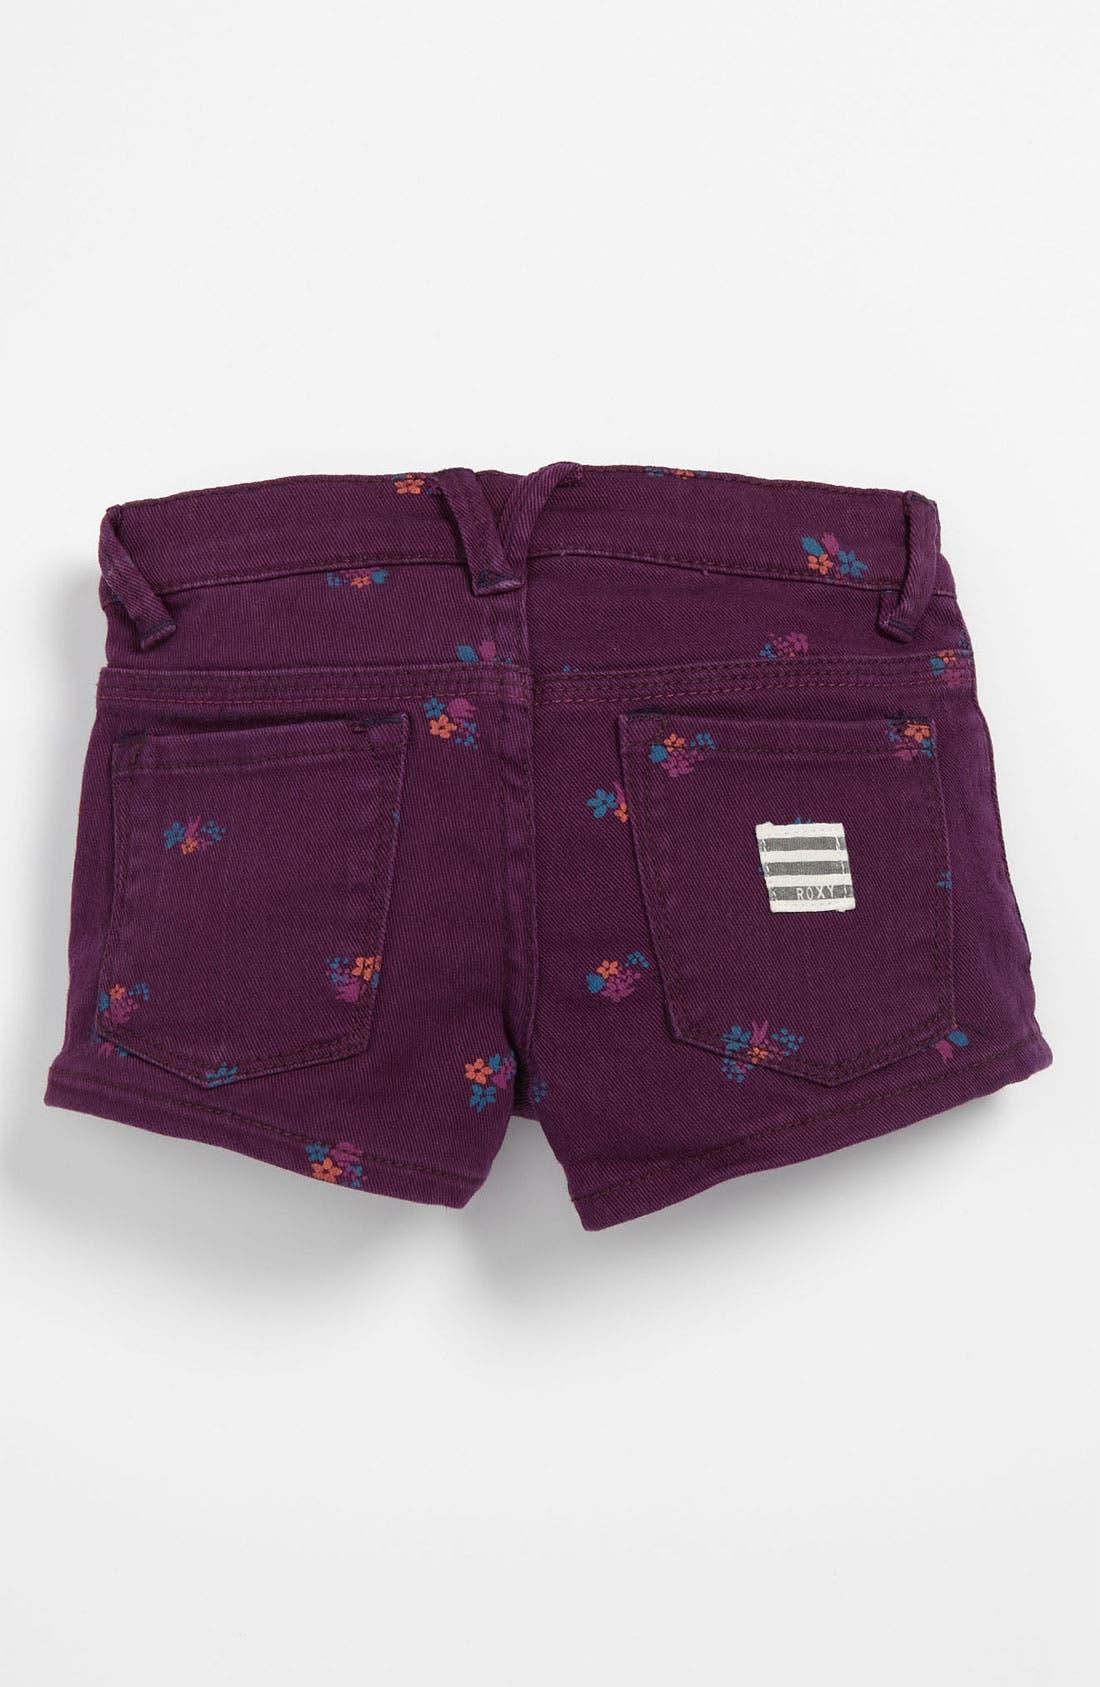 Alternate Image 1 Selected - Roxy 'Sundown' Colored Shorts (Big Girls)